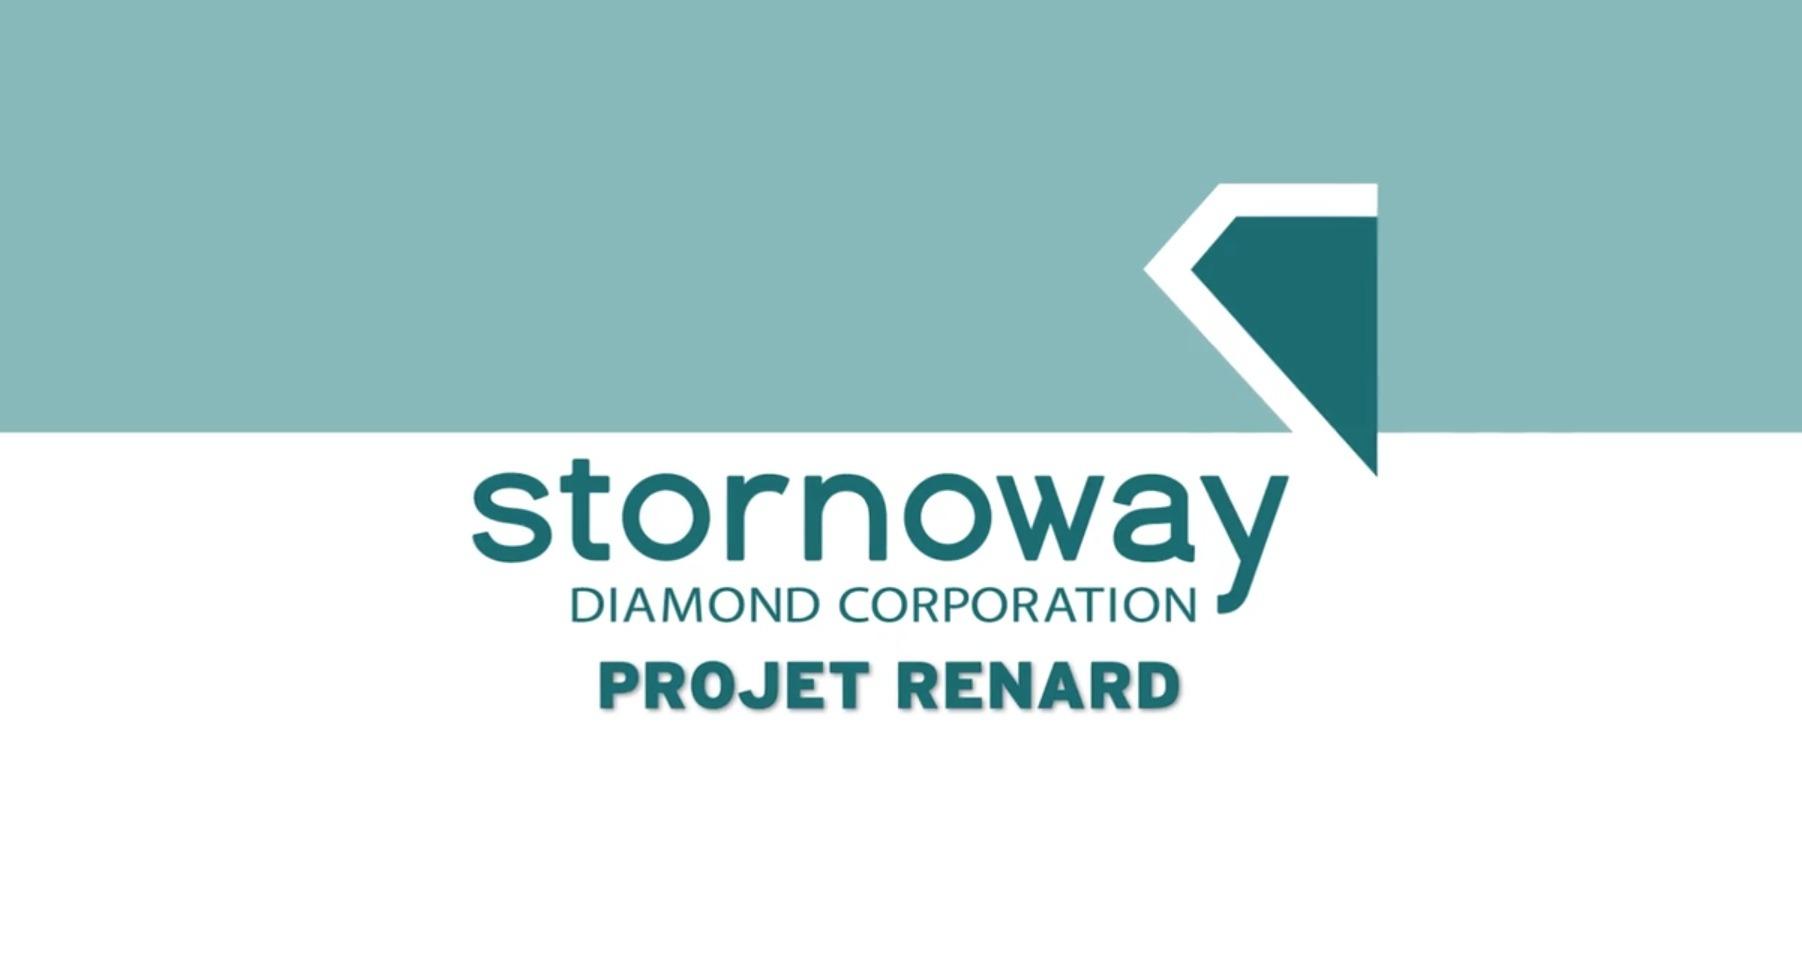 stornoway-projet-renard